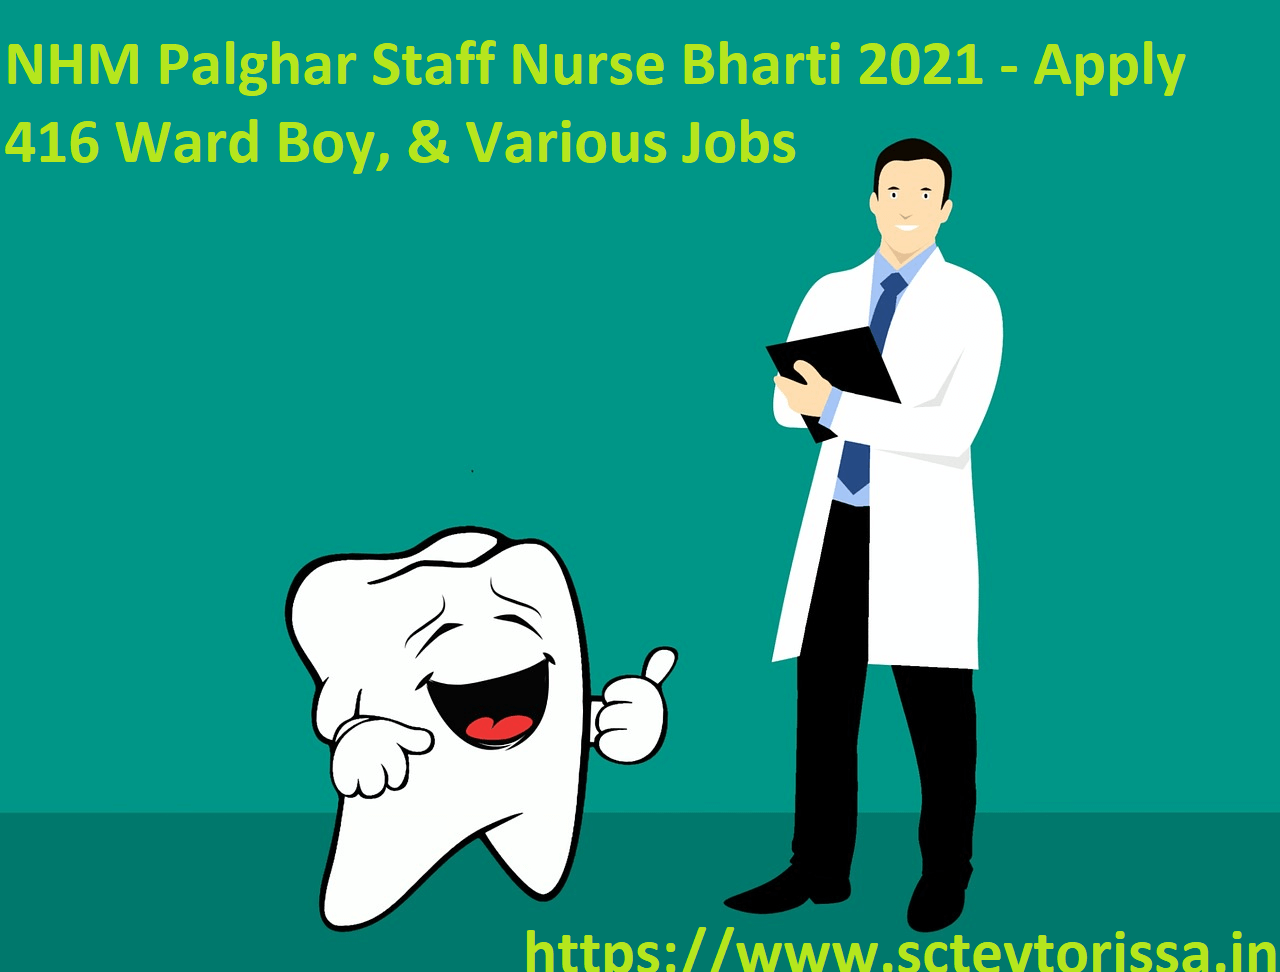 NHM Palghar Staff Nurse Bharti